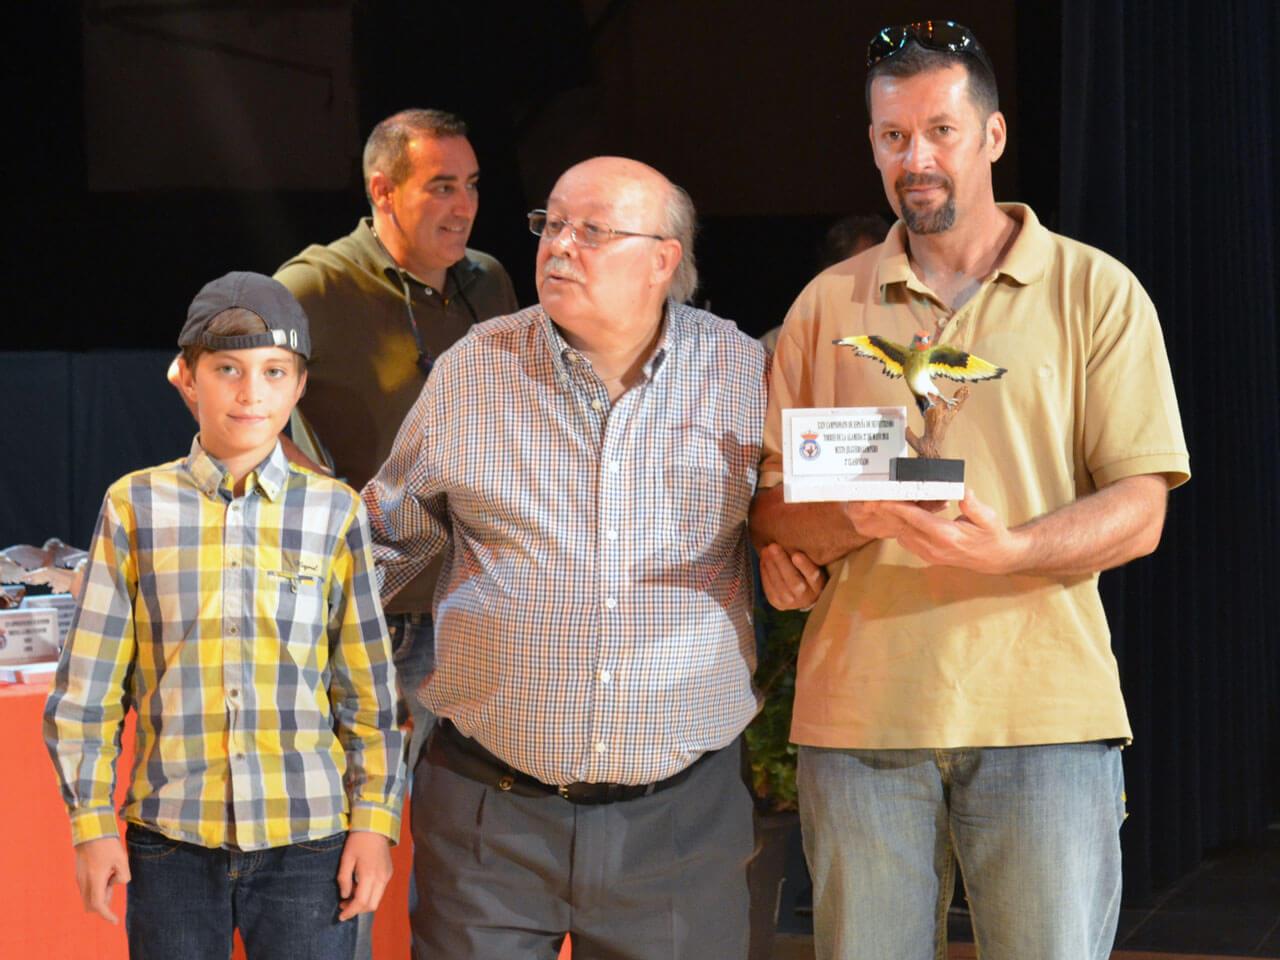 Campeonato España Cante 2018 - Juan Carlos Penedo 3º Clasif M Jilg